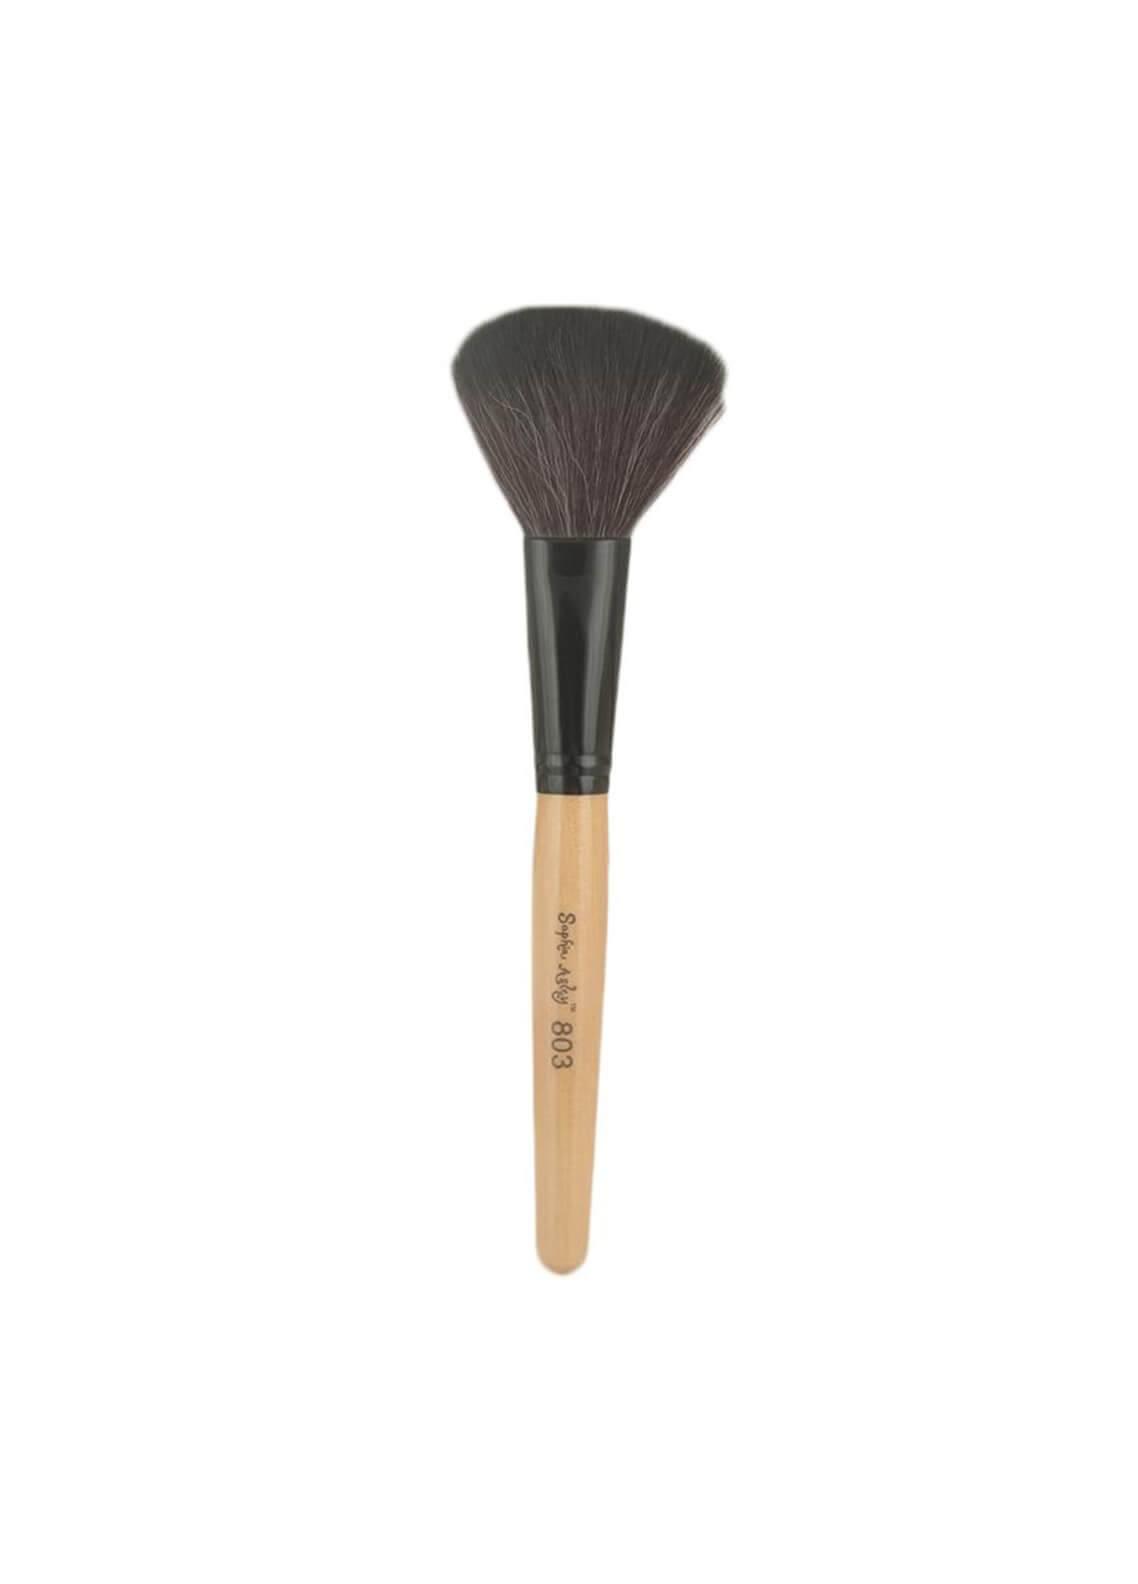 Sophia Asley Professional Wooden Powder Brush